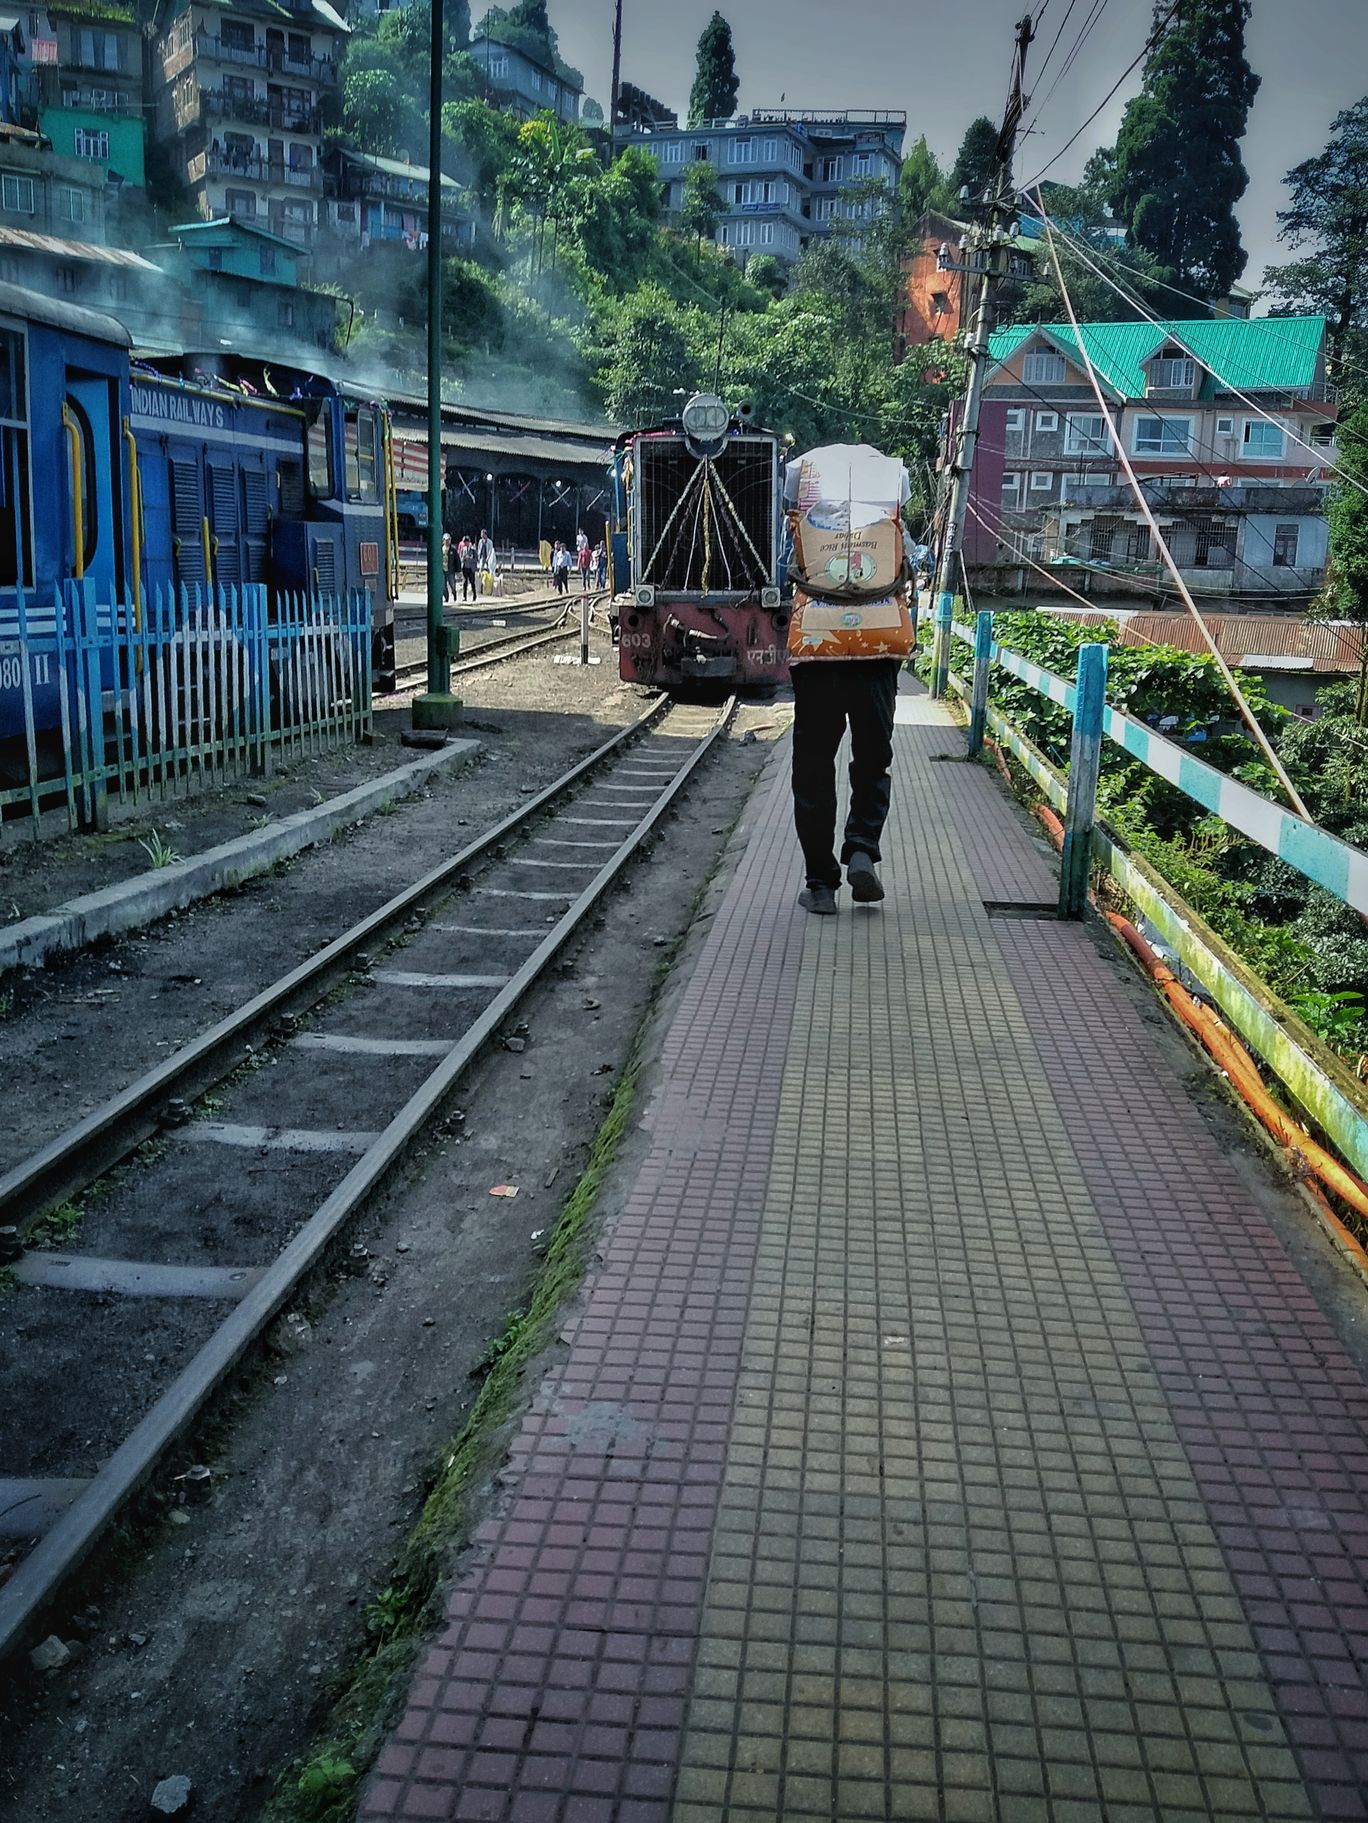 Photo of Darjeeling By Apoorv Shrivastava